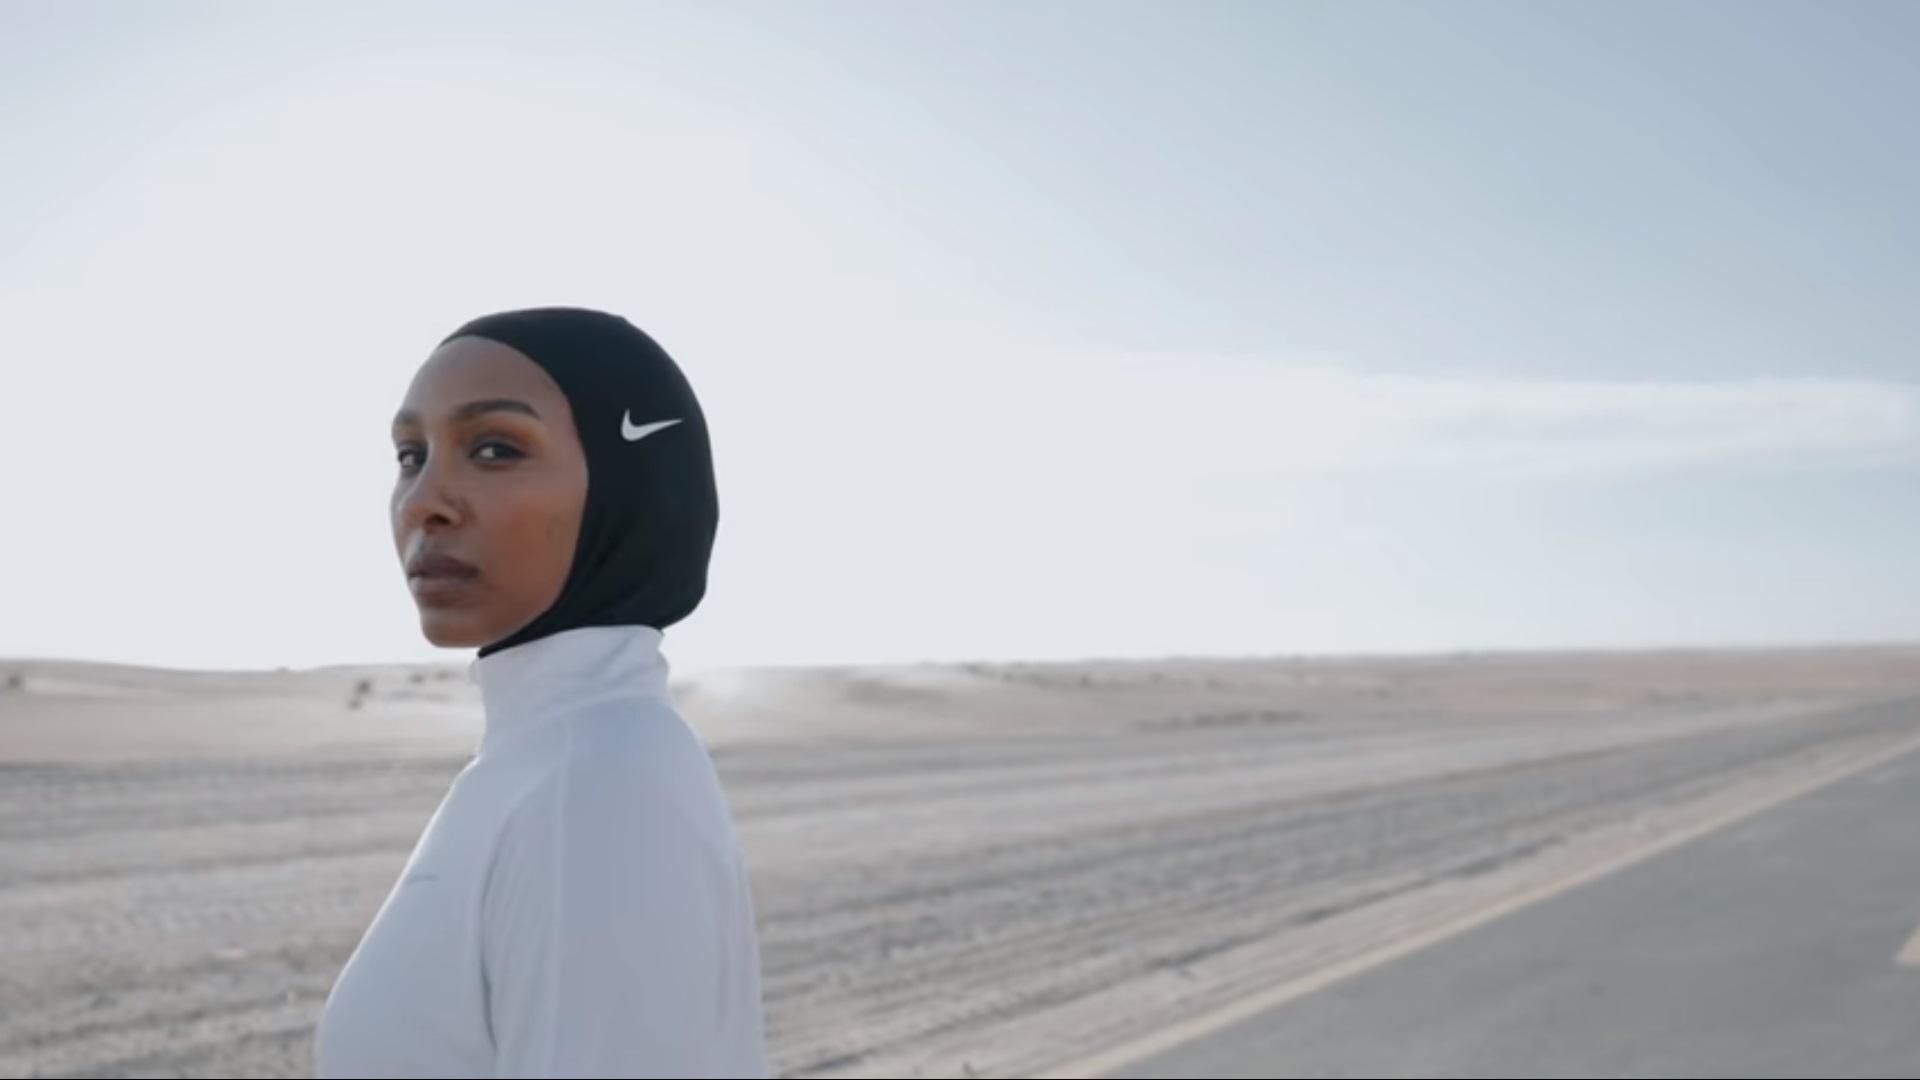 A Milano Nike vende hijab sportivi, Sardone: 'sfrutta l'oppressione femminile'